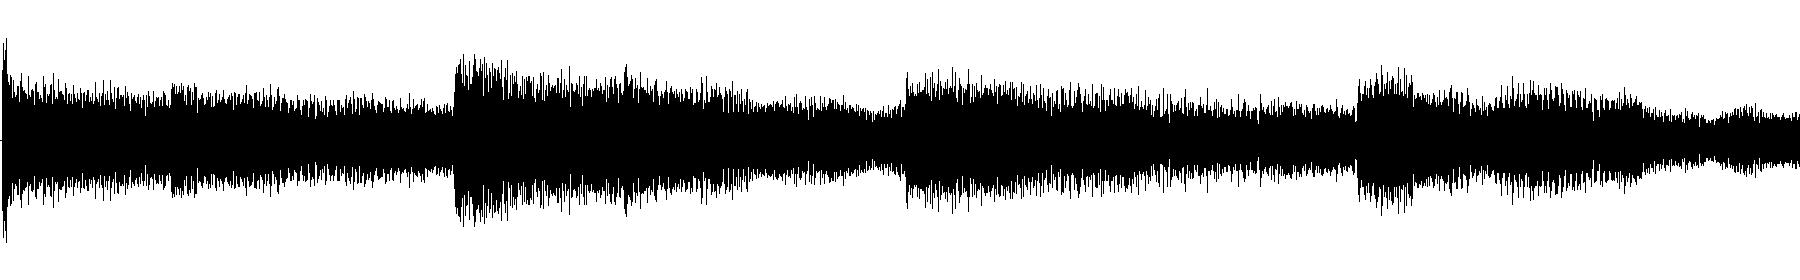 vedh melodyloop 069 b major 122bpm